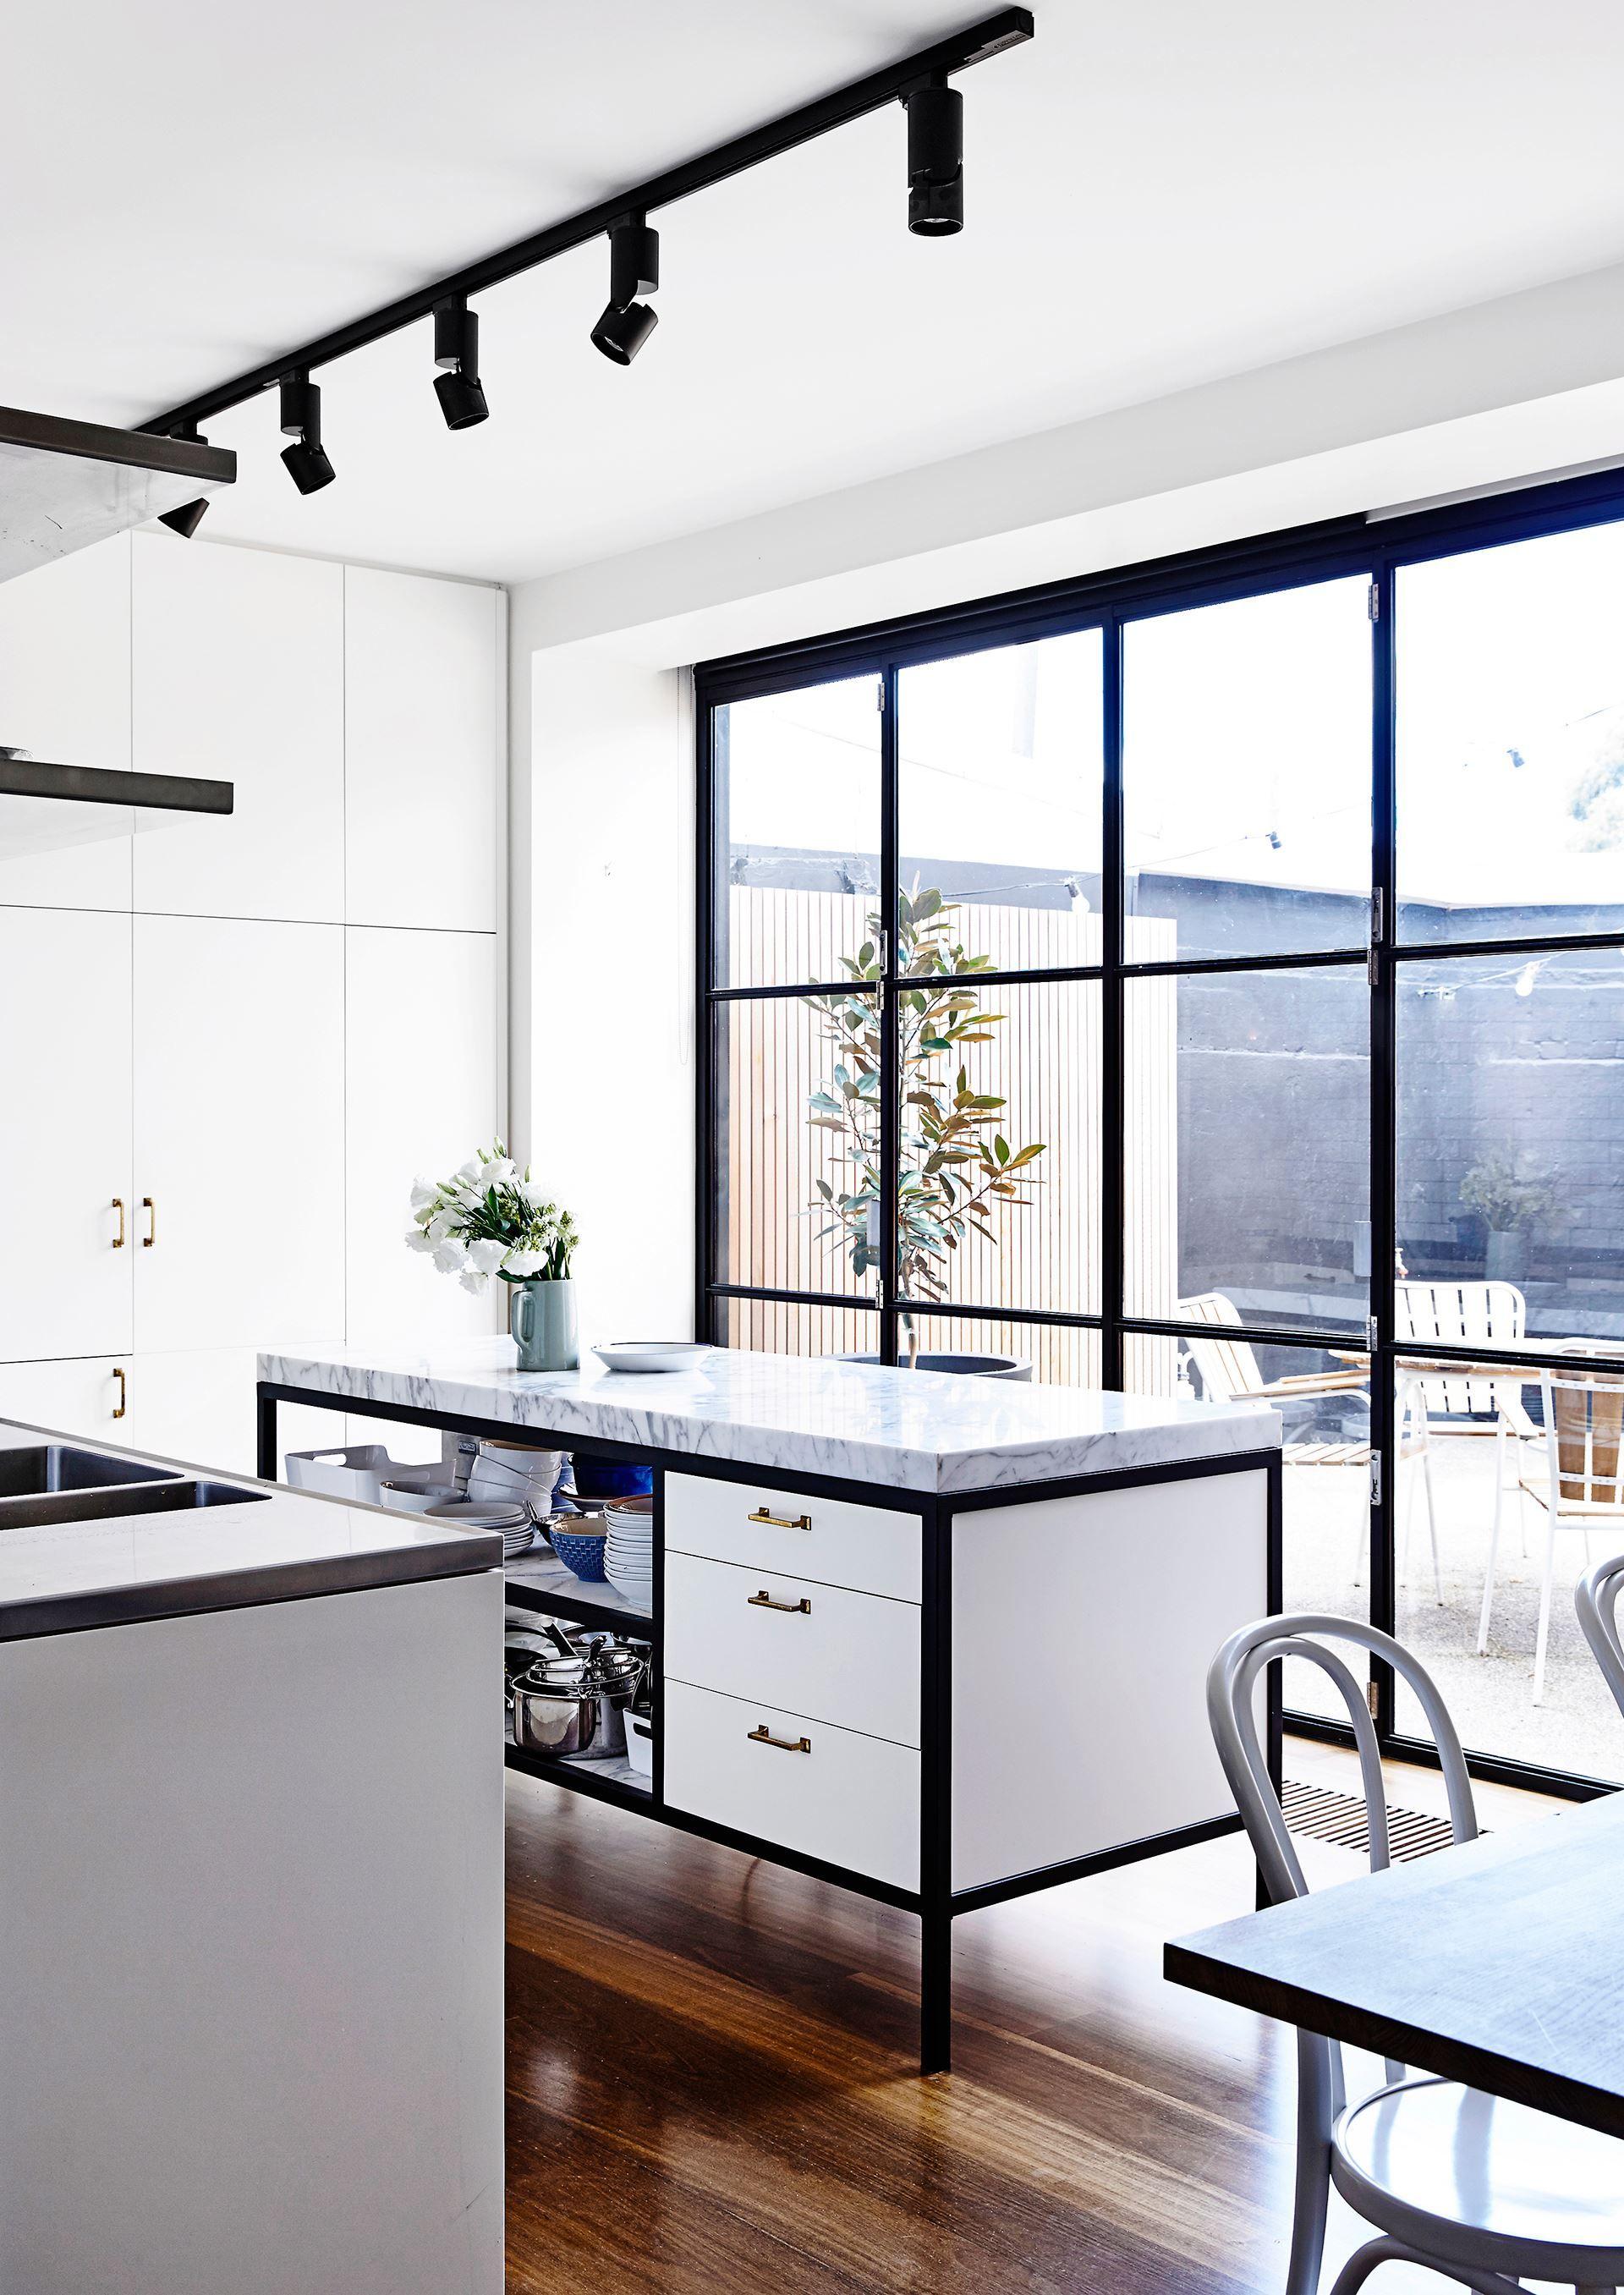 kitchens with wow factor house pinterest kitchen interior